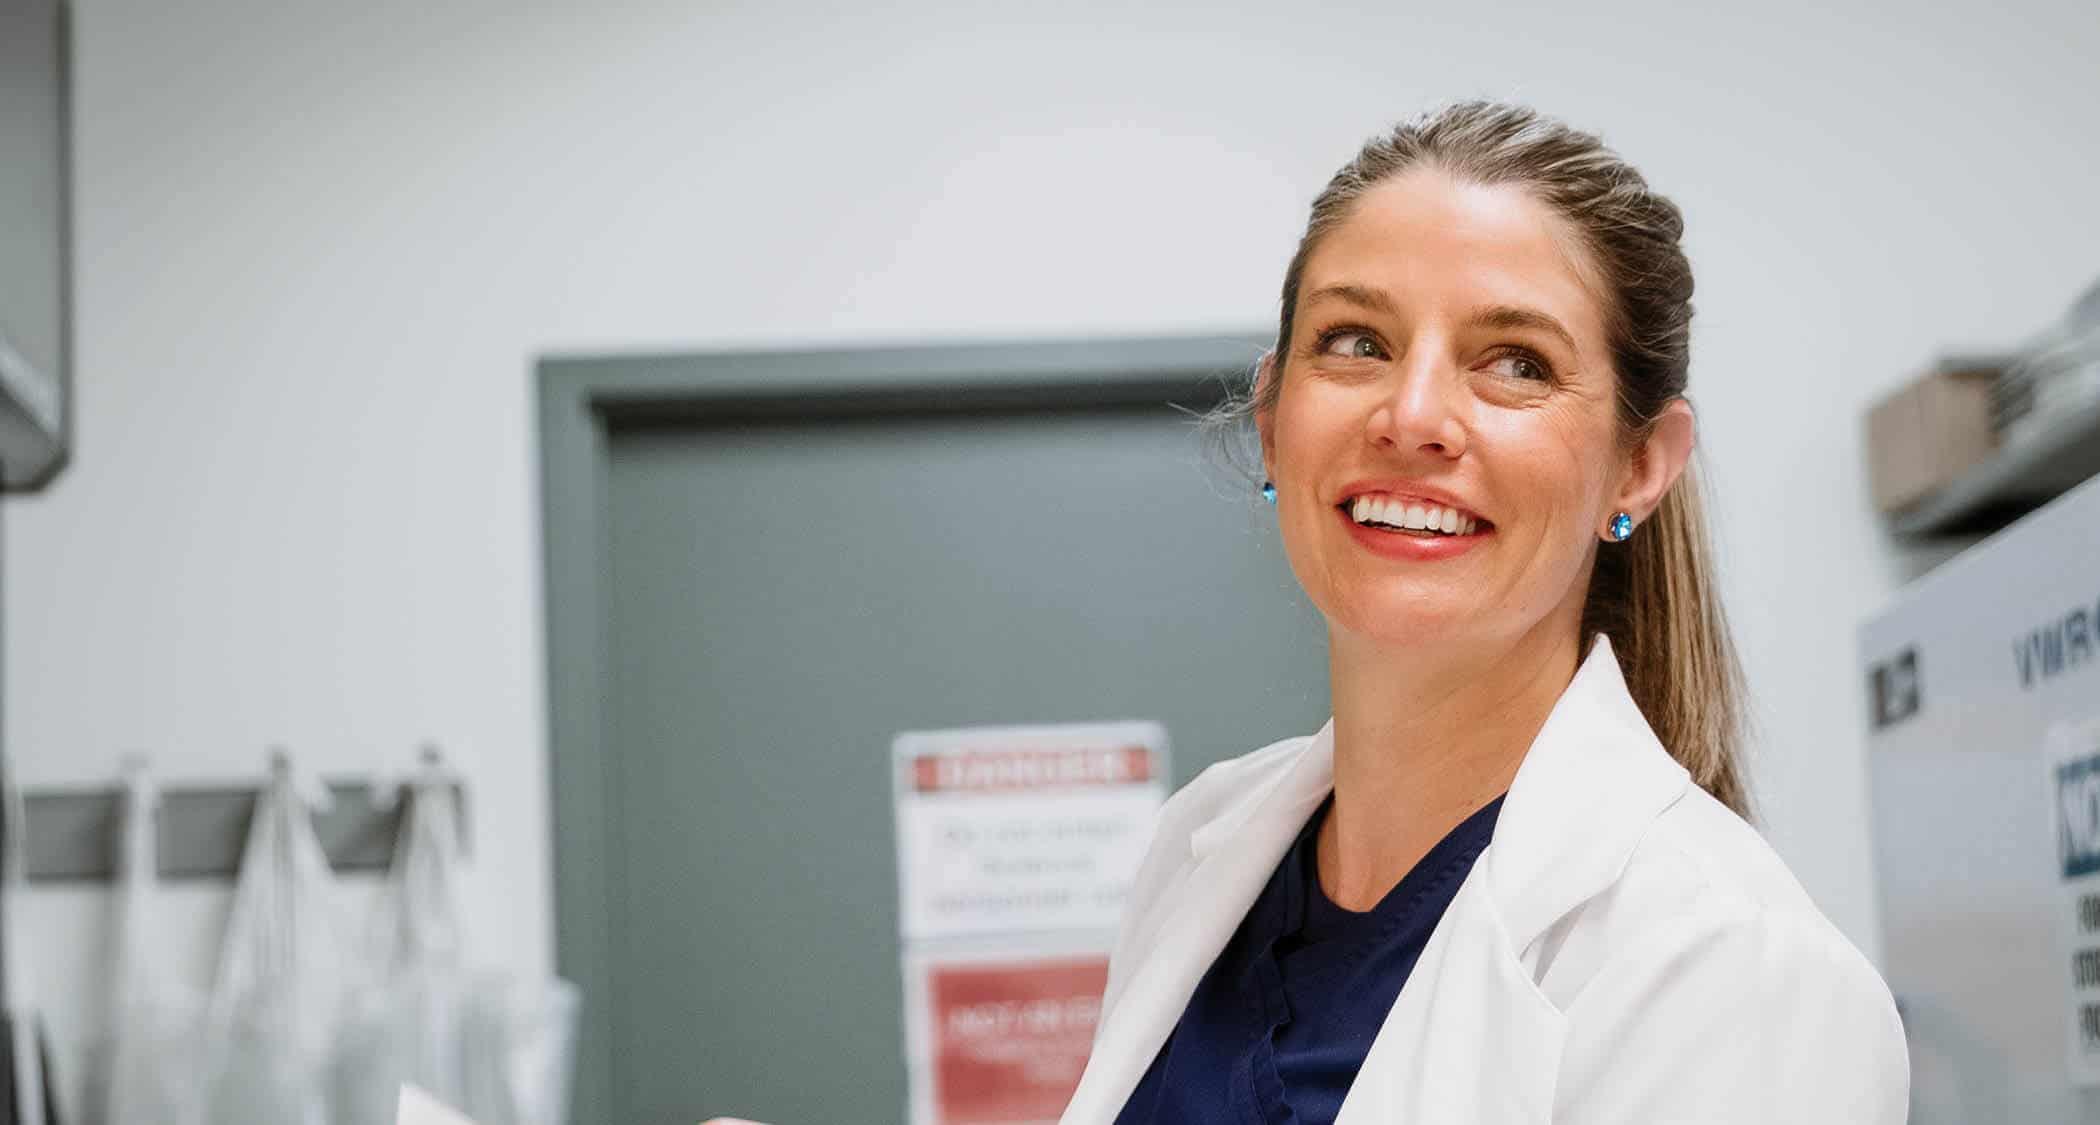 A healthcare professional: Regent University offers an MSN degree program online and in Virginia Beach, VA 23464.